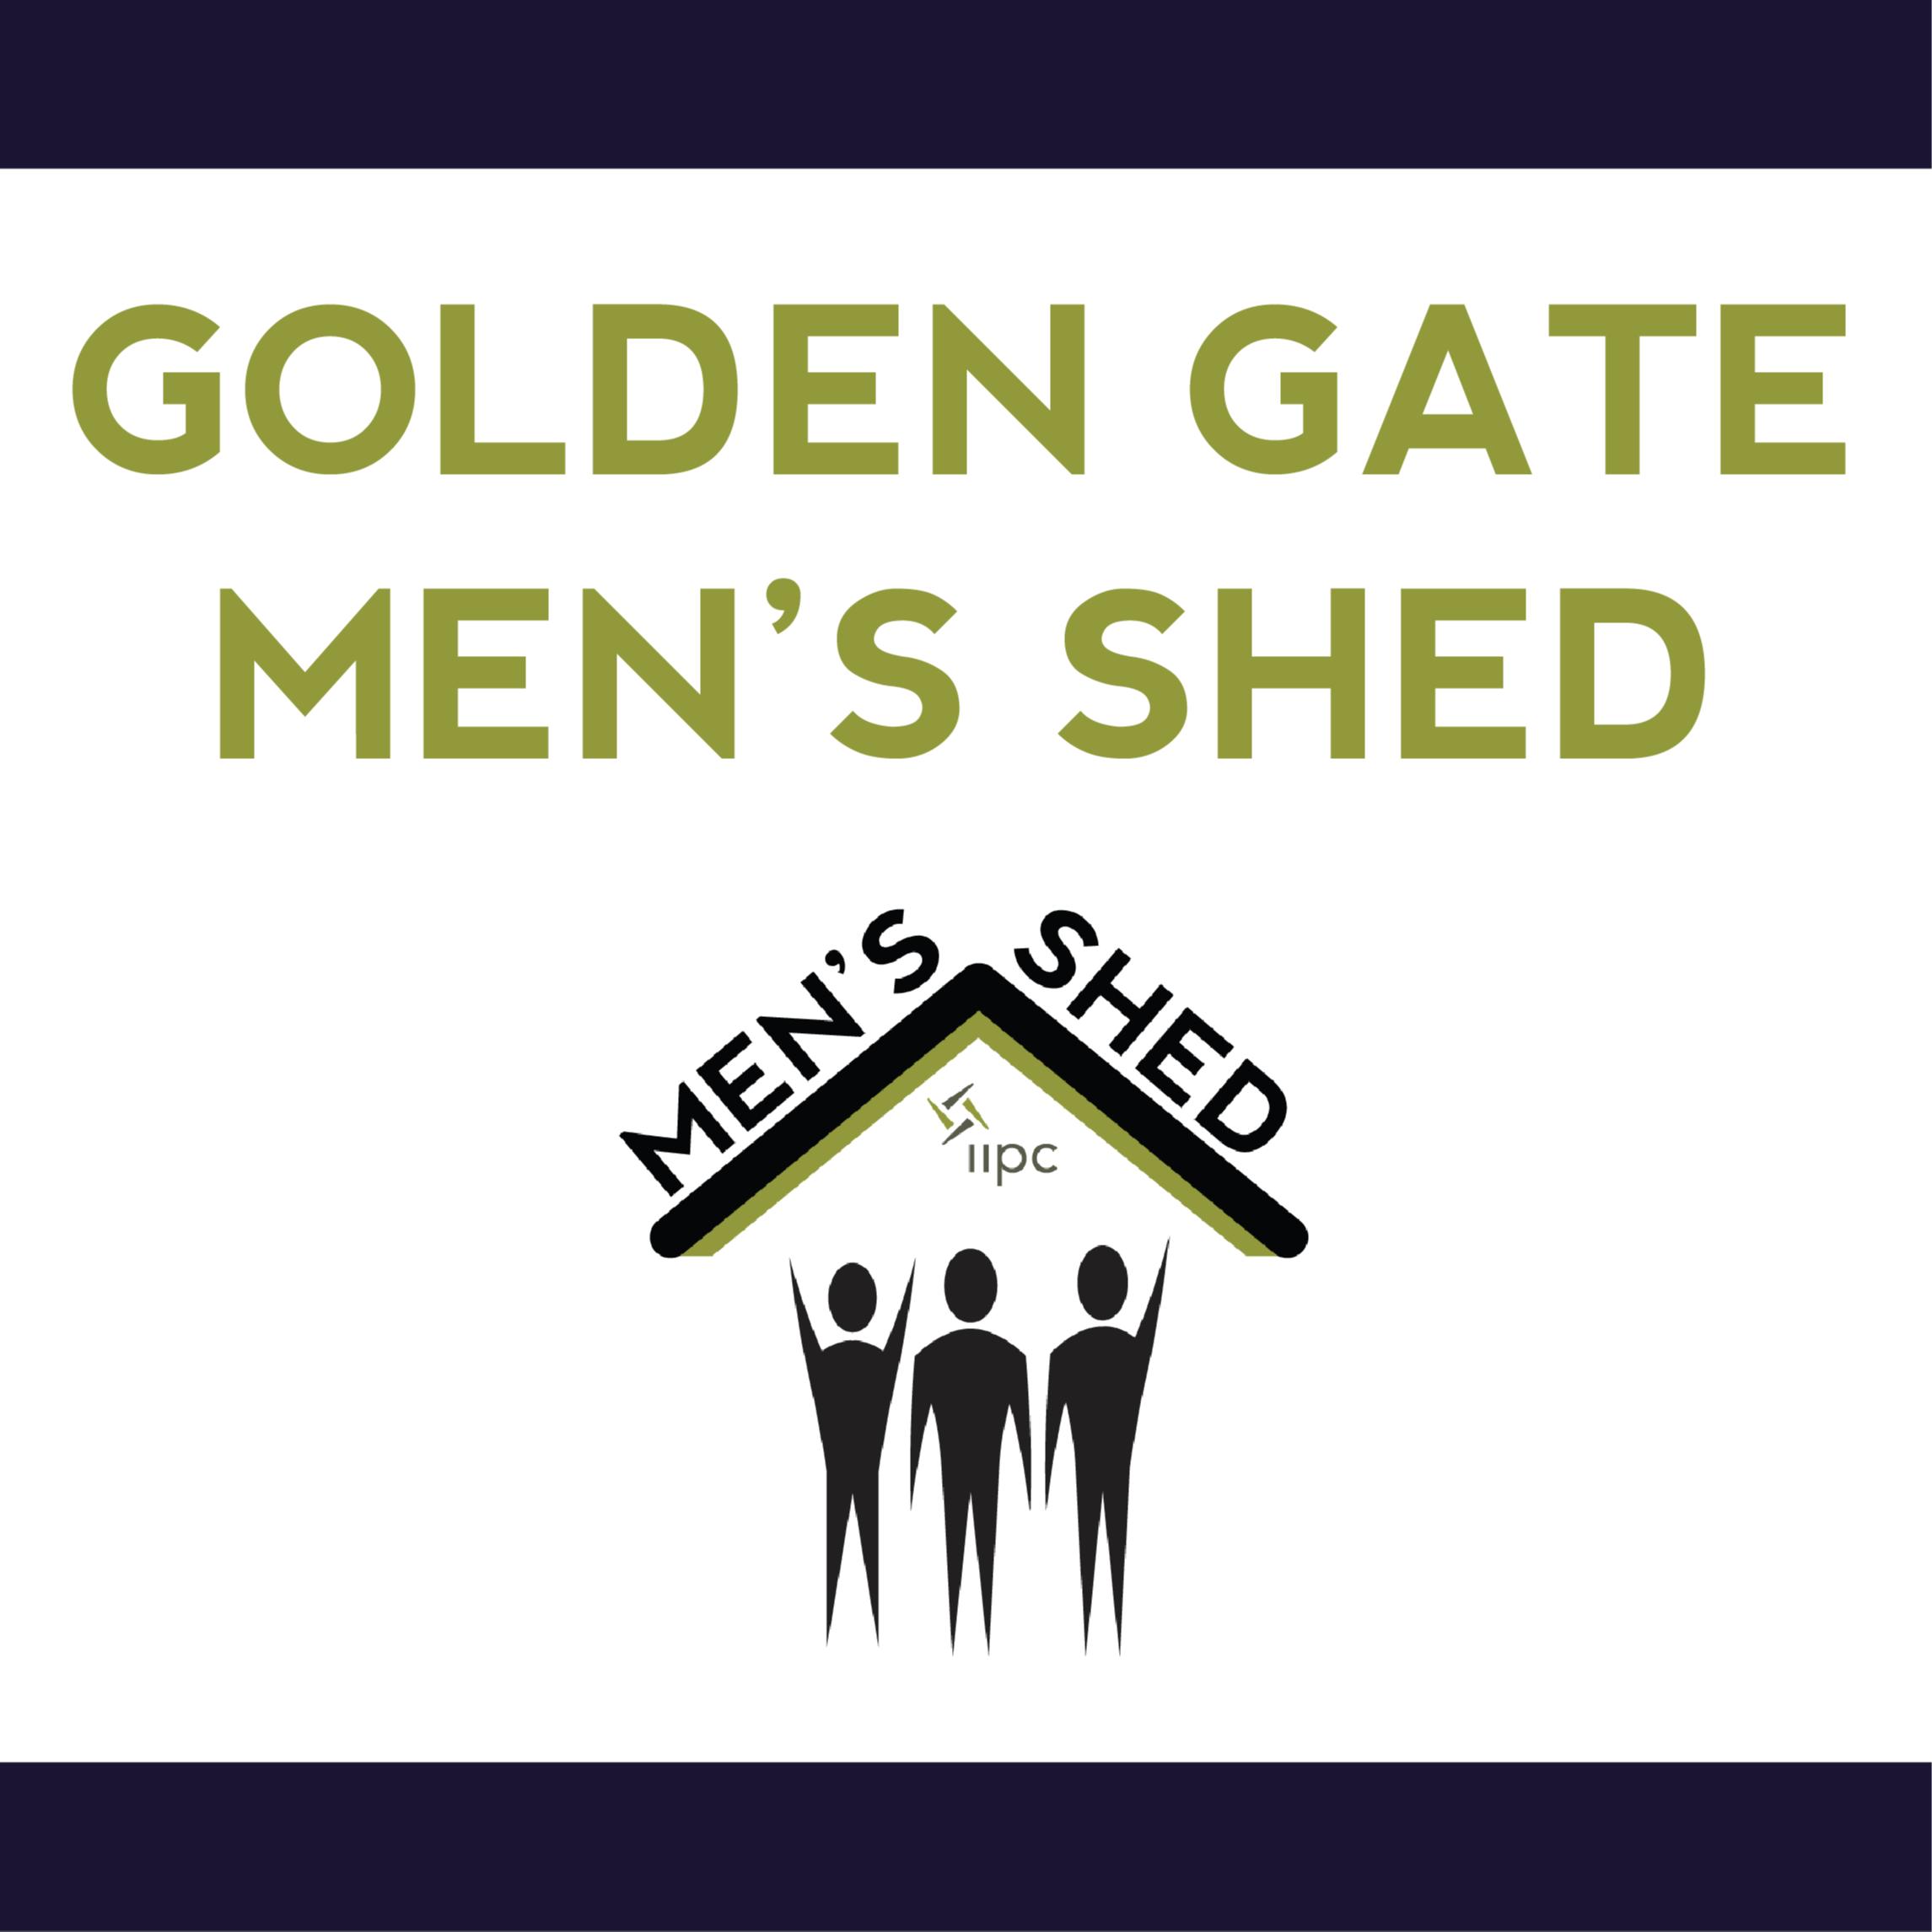 Golden Gate Men's Shed - Mondays at 6:30 p.m.